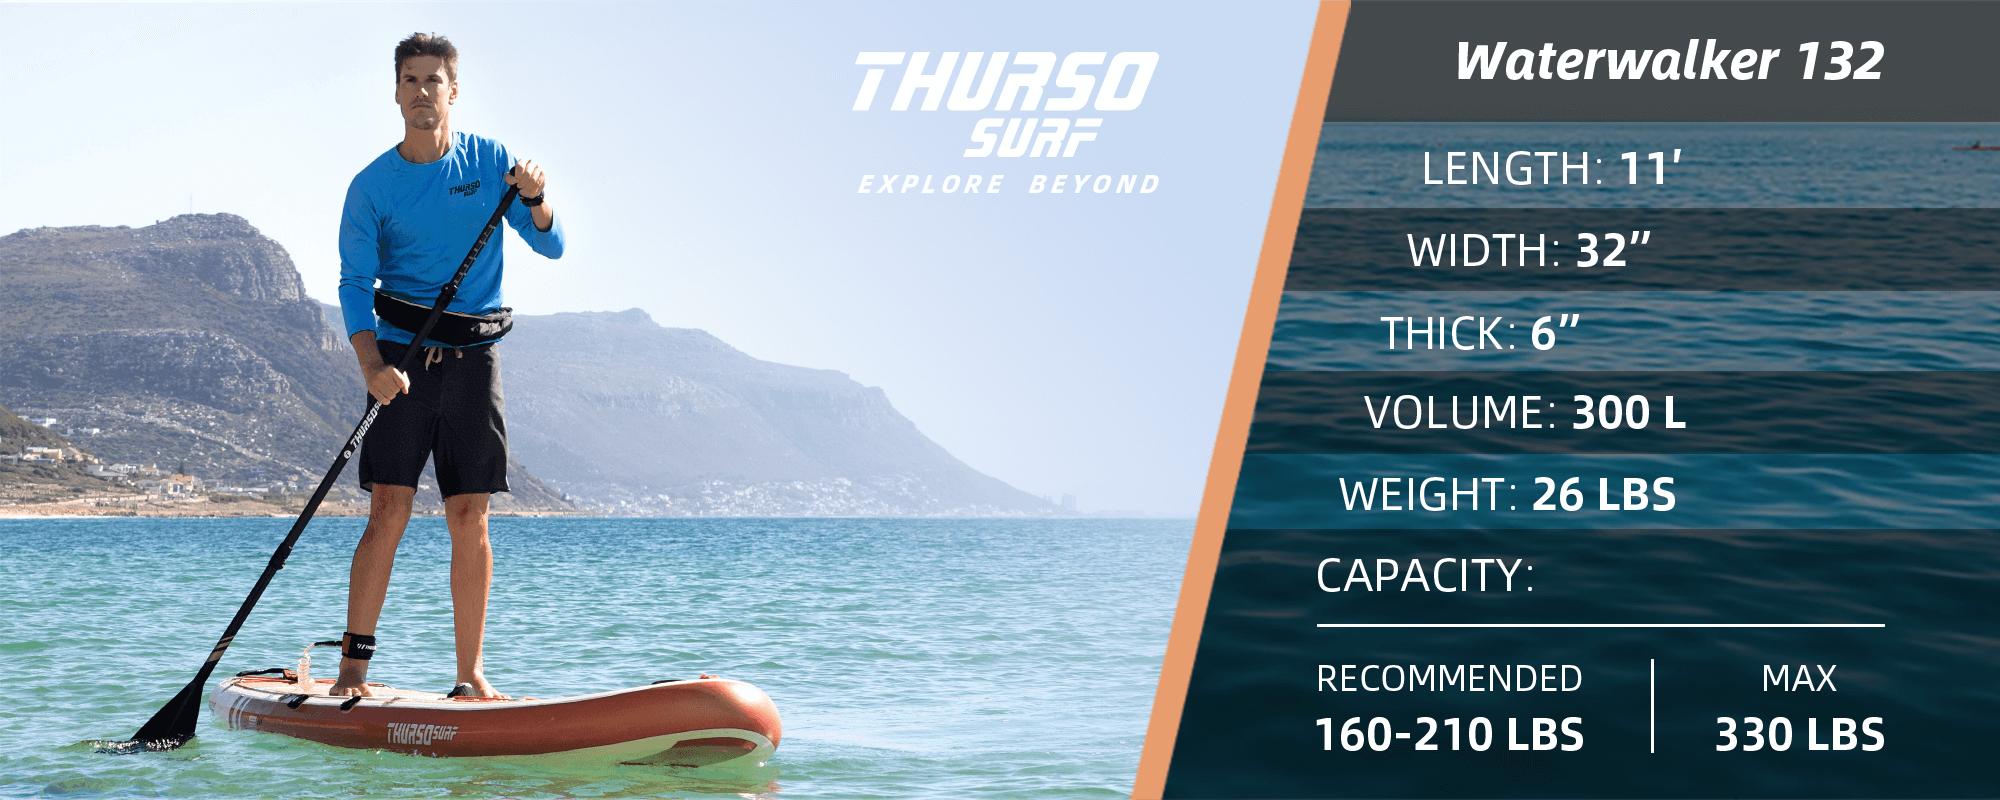 Thurso-Surf-Waterwalker-132-2021-specs